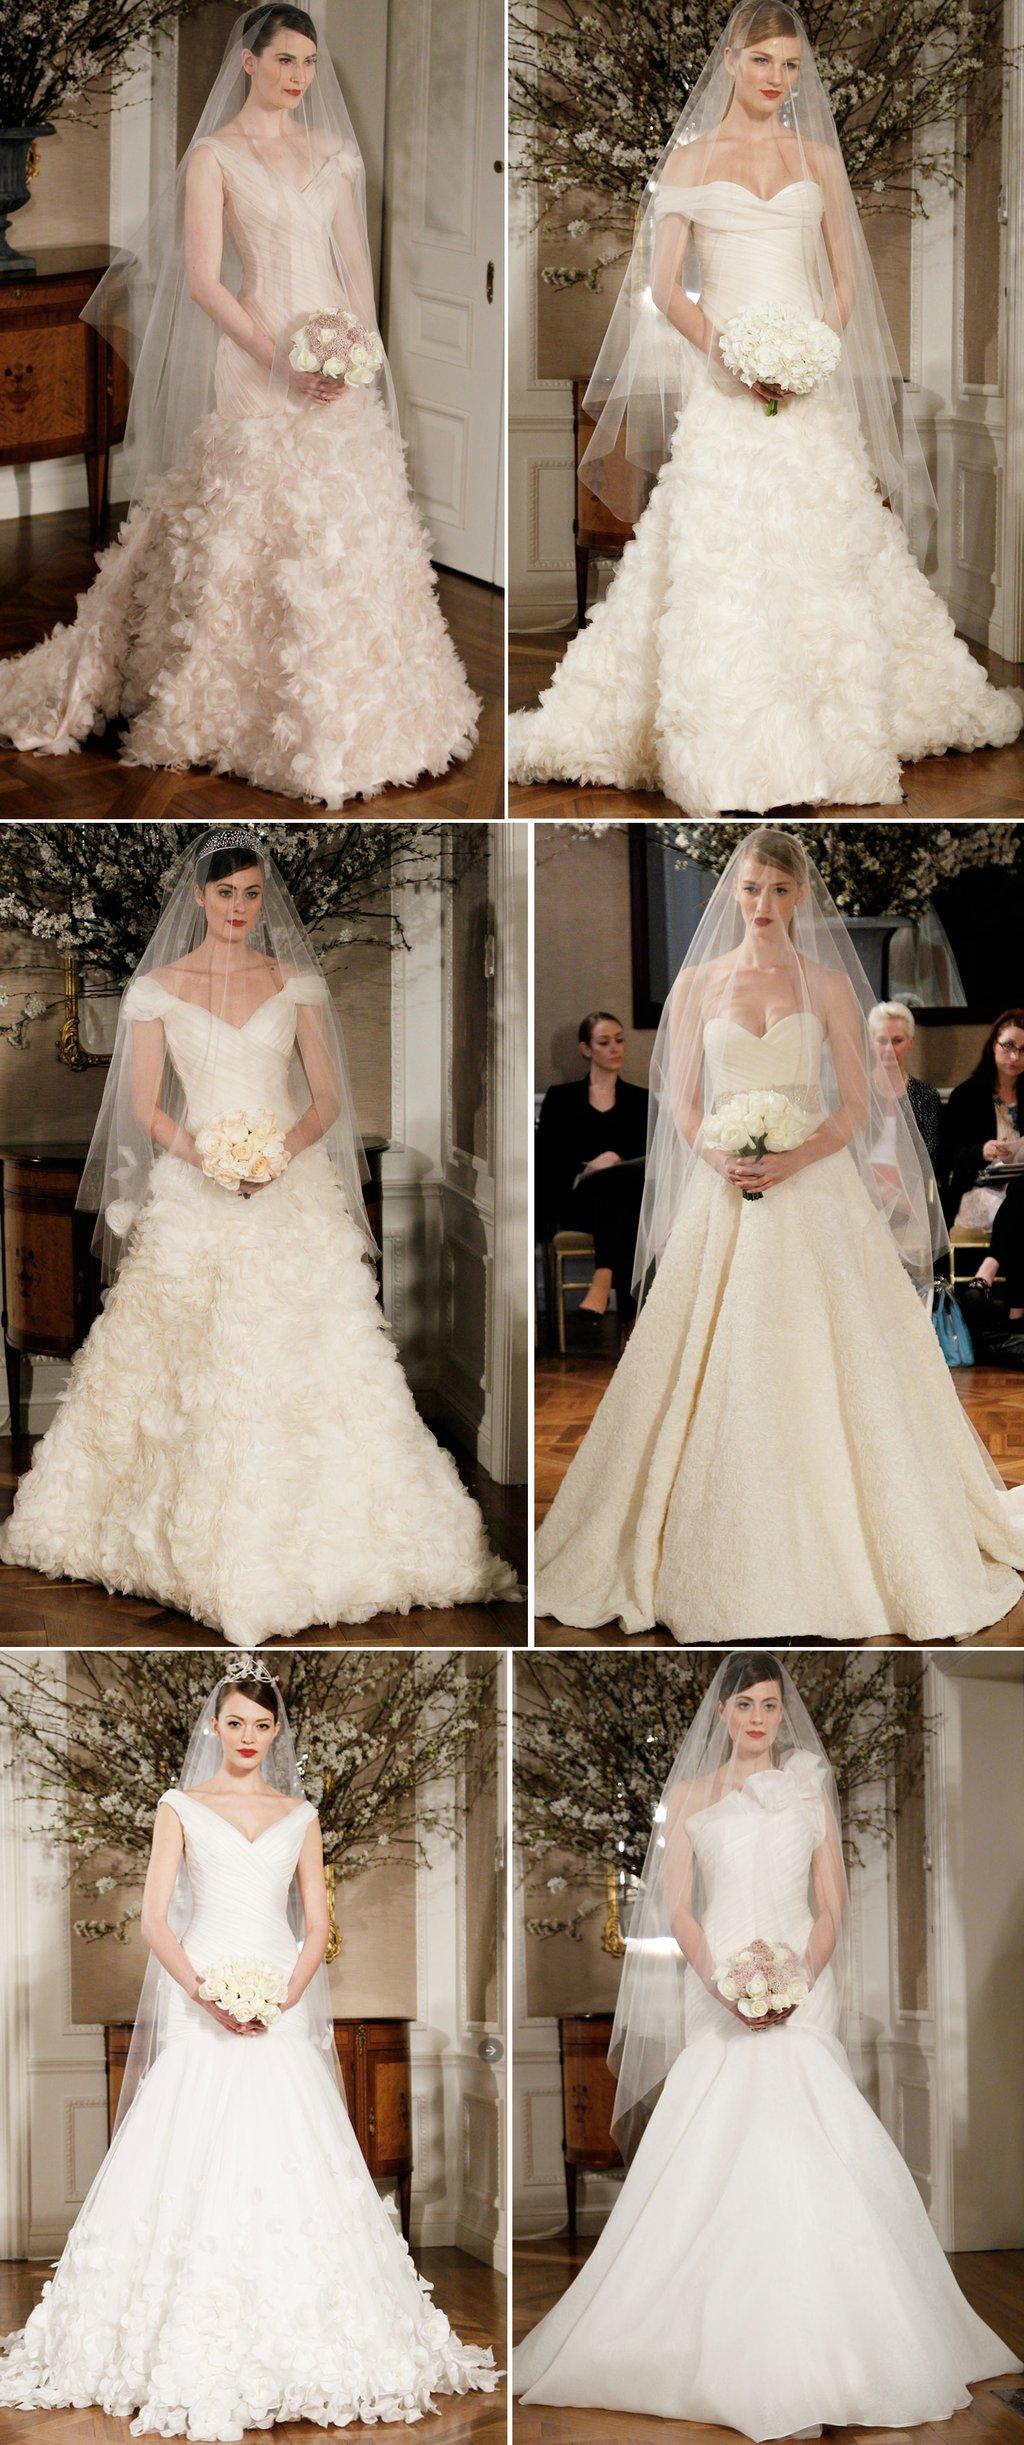 Romona-keveza-wedding-dresses-spring-2012-bridal-gowns.full